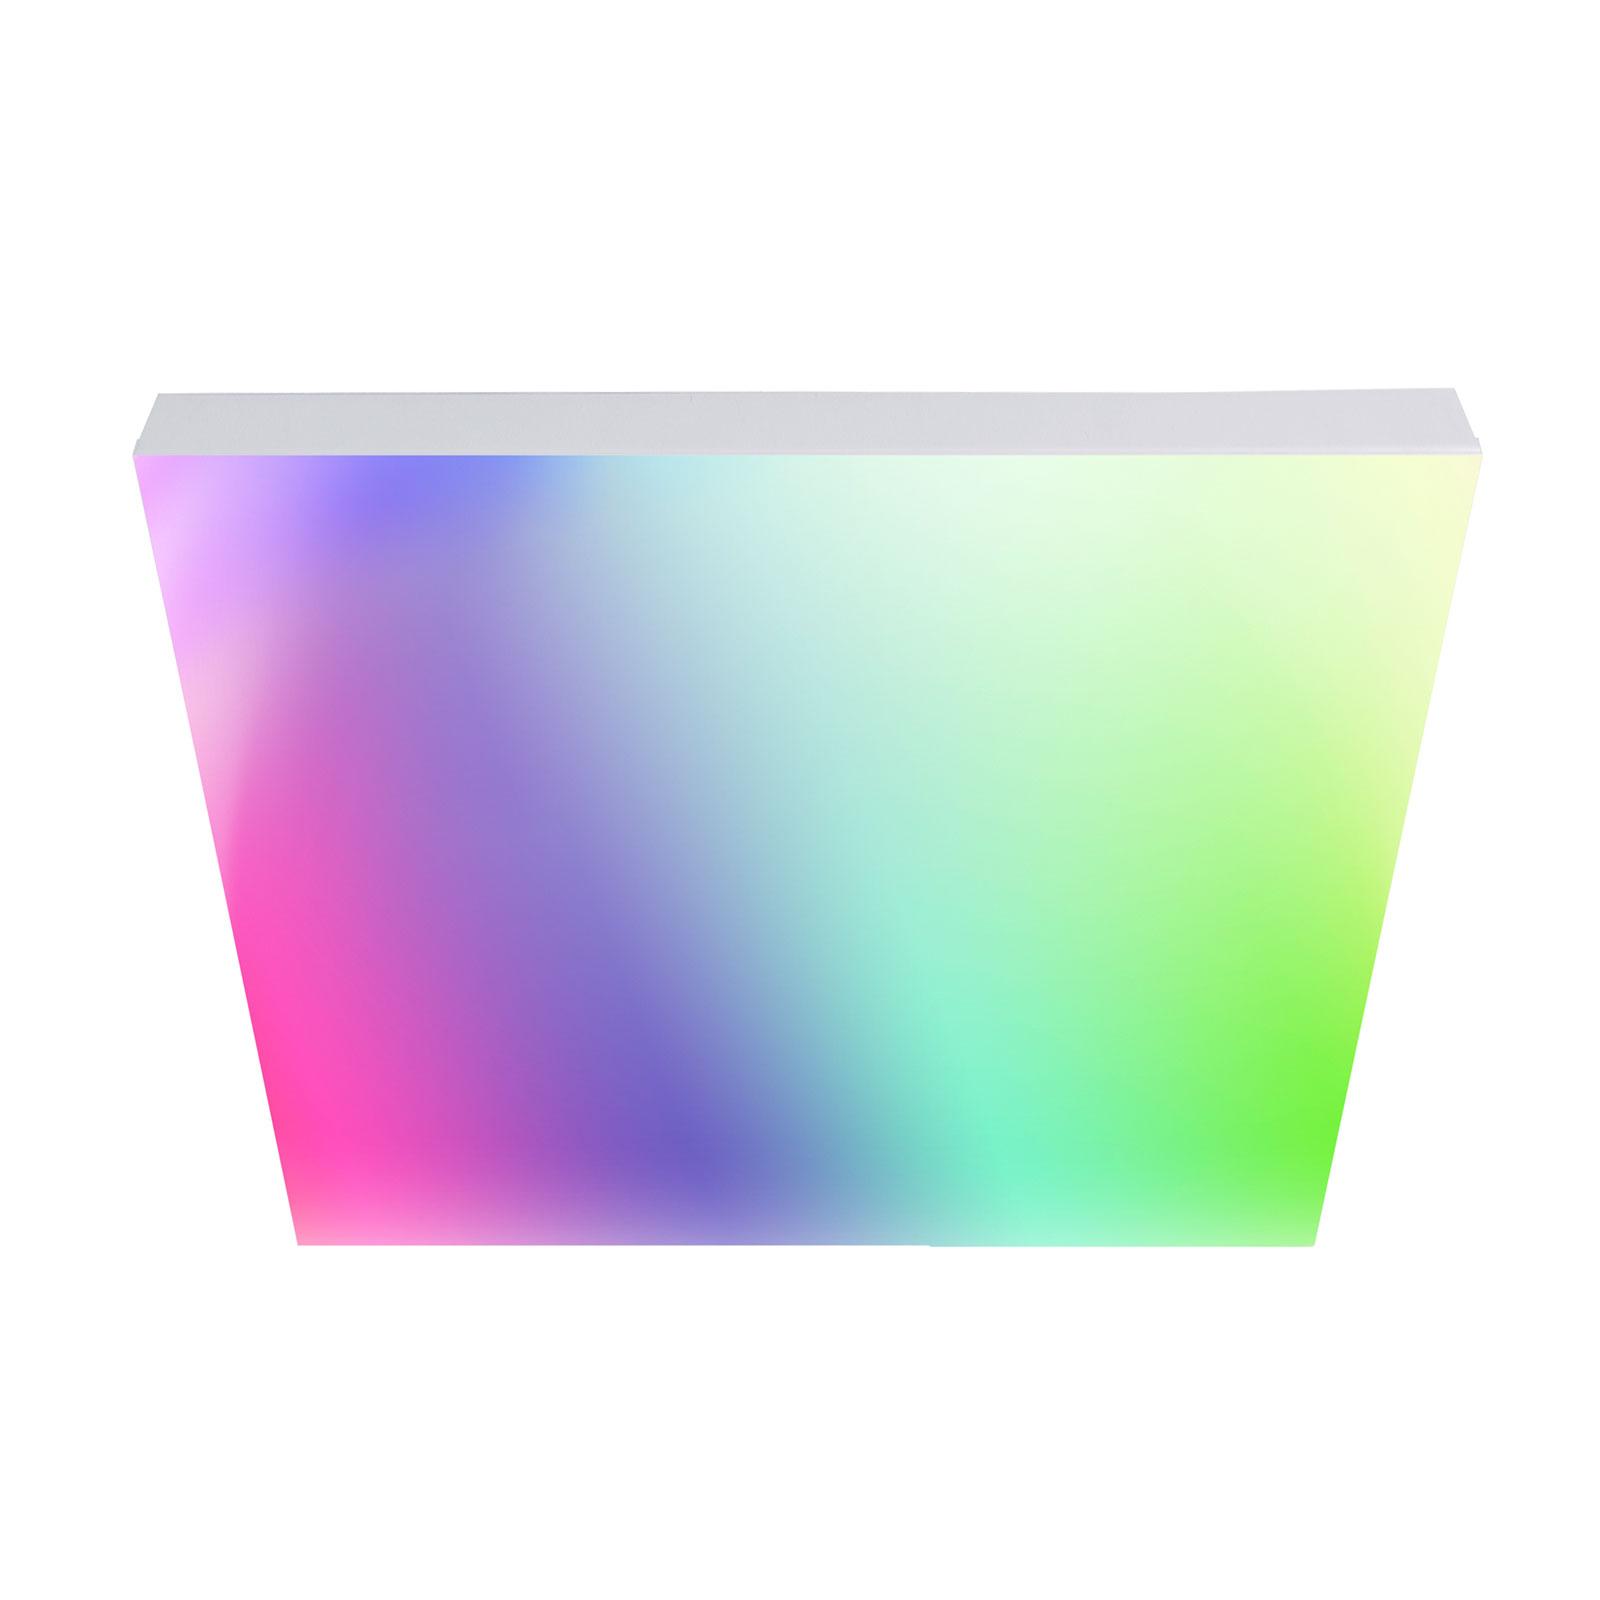 Müller Licht tint LED-panel Aris 30 x 30 cm RGBW